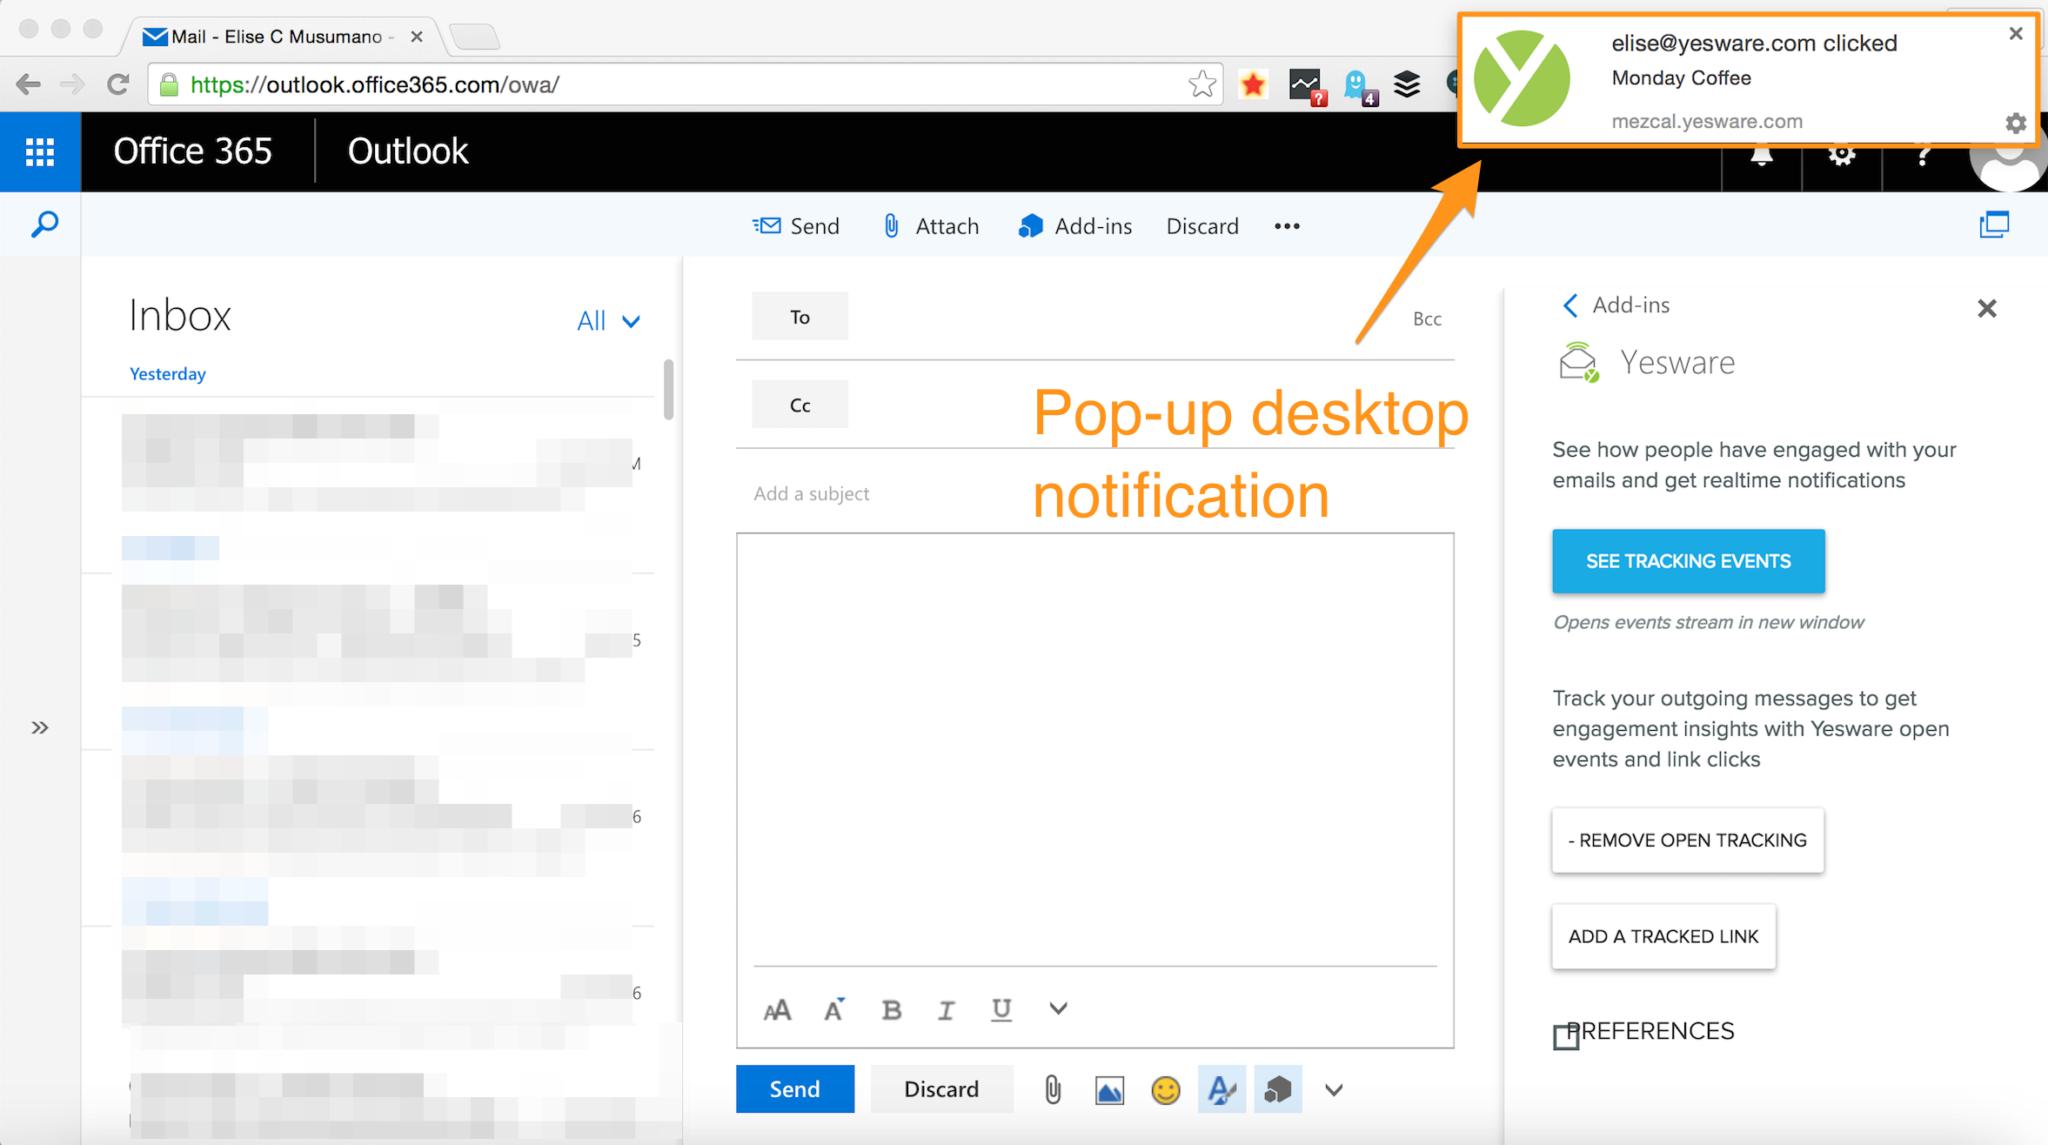 pop-up-desktop-notification-yesware-O365